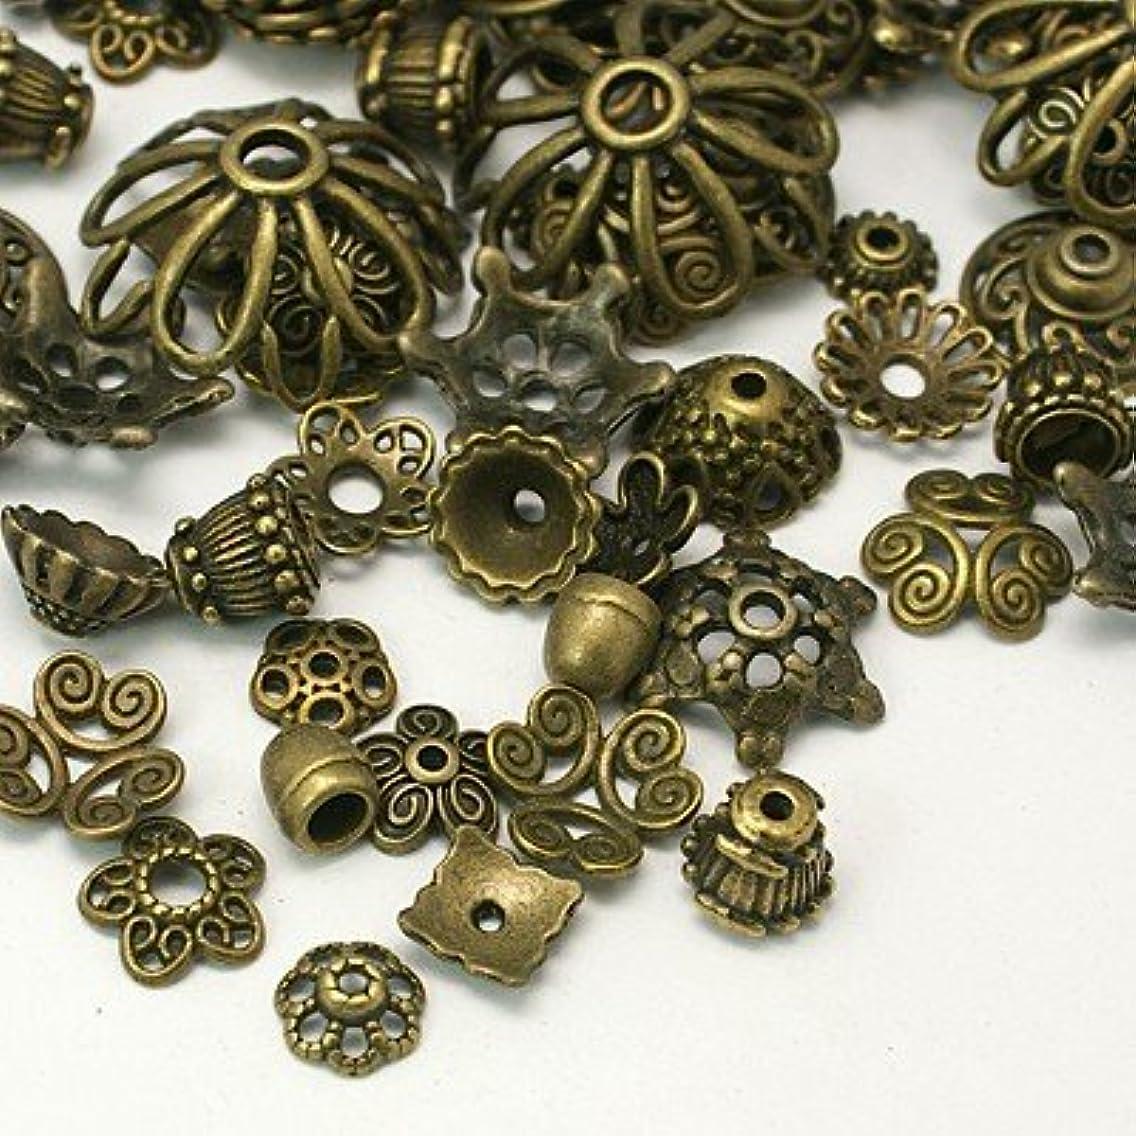 PEPPERLONELY Brand 50 Gram Antiqued Bronze Tibetan Style Bead Caps 8mm ~ 20mm